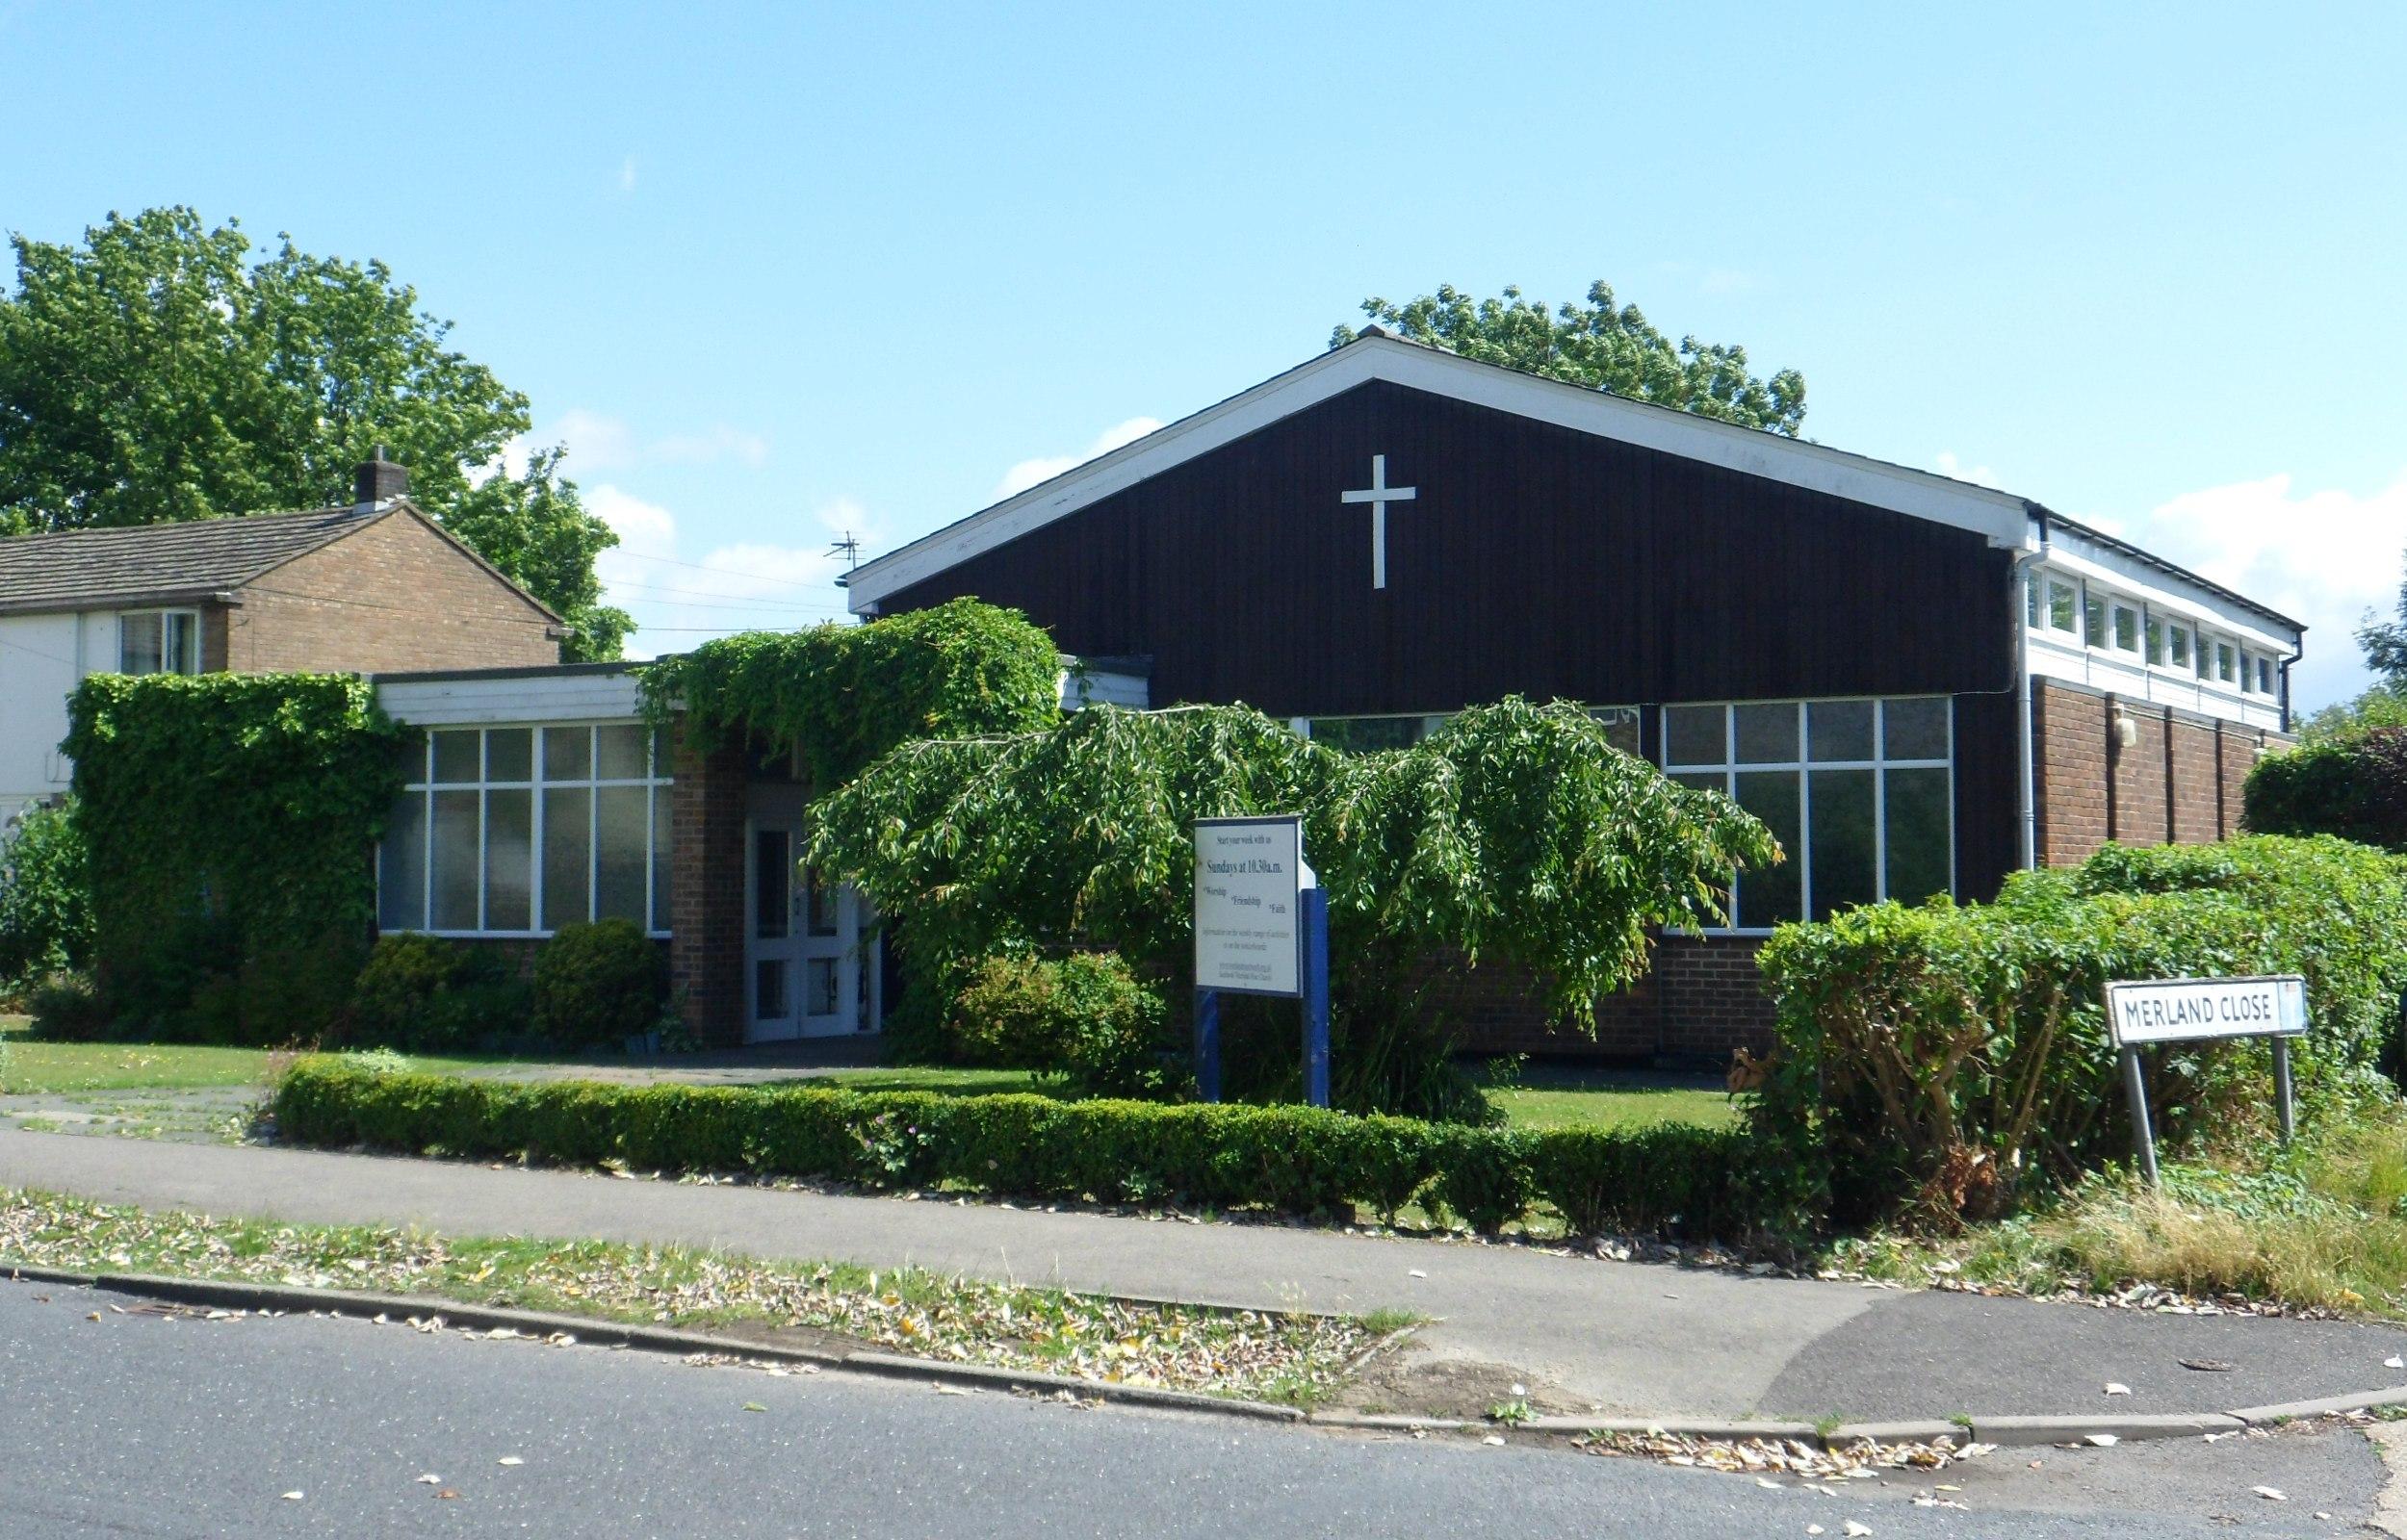 File:Merland Rise Church, Merland Rise, Tadworth JPG